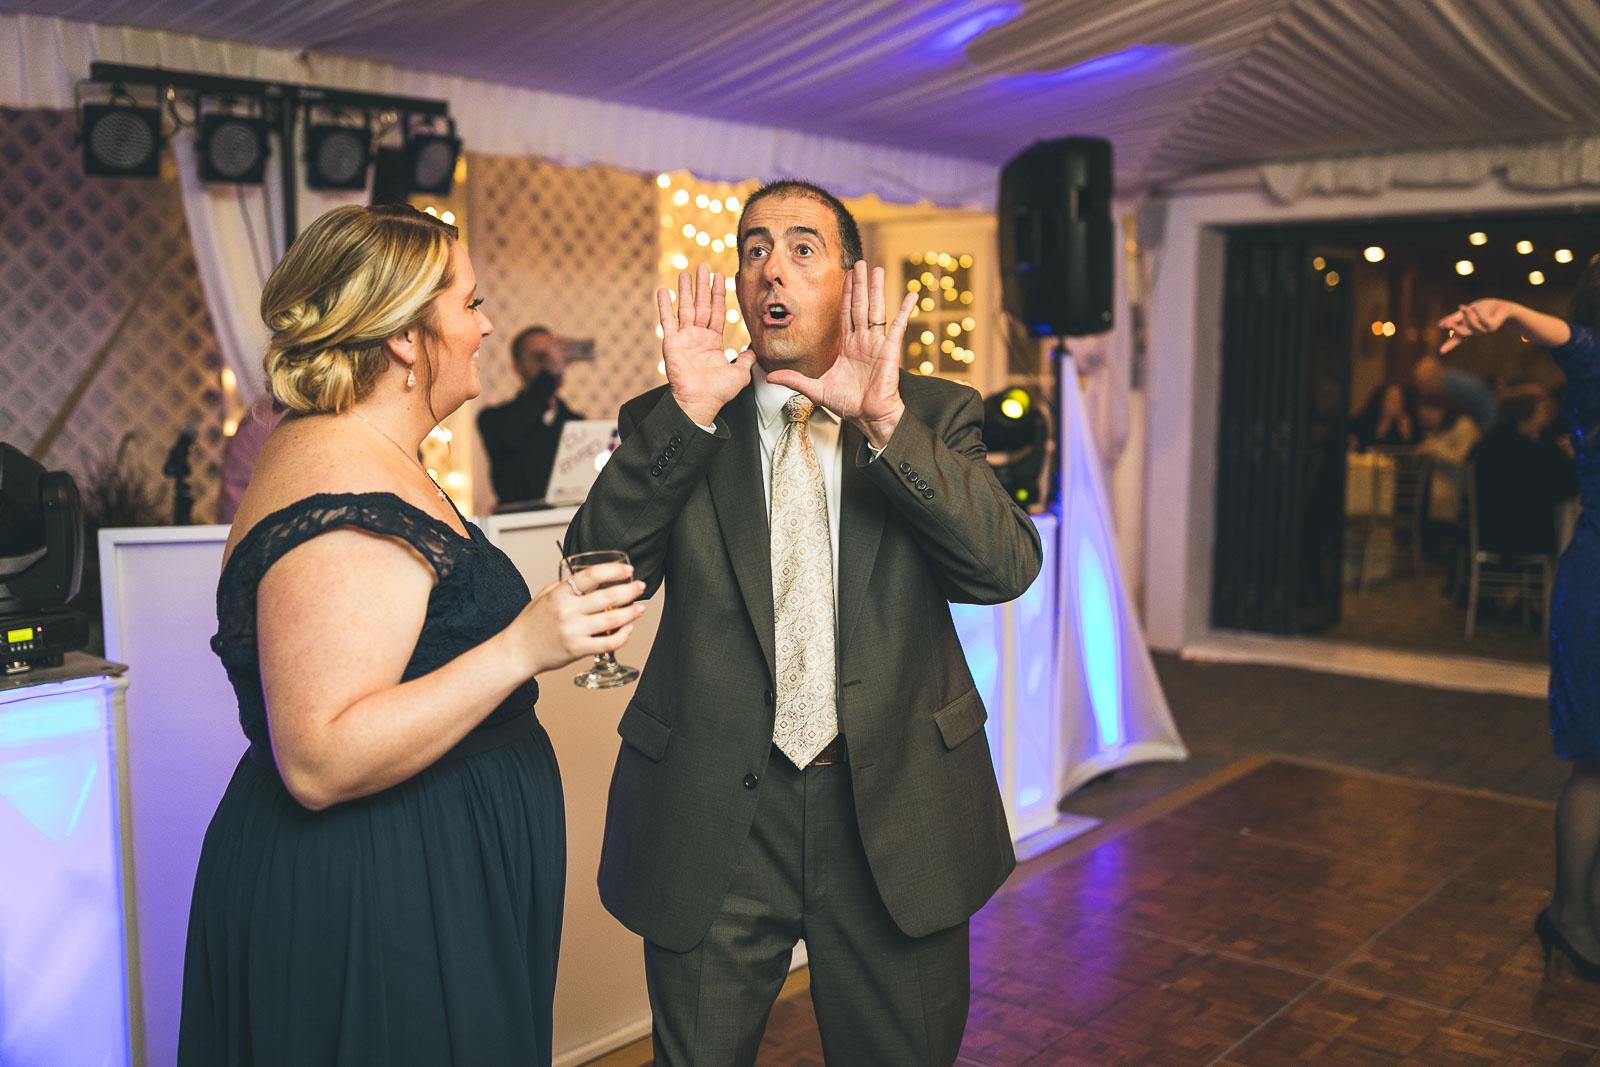 The Grain House Wedding Reception